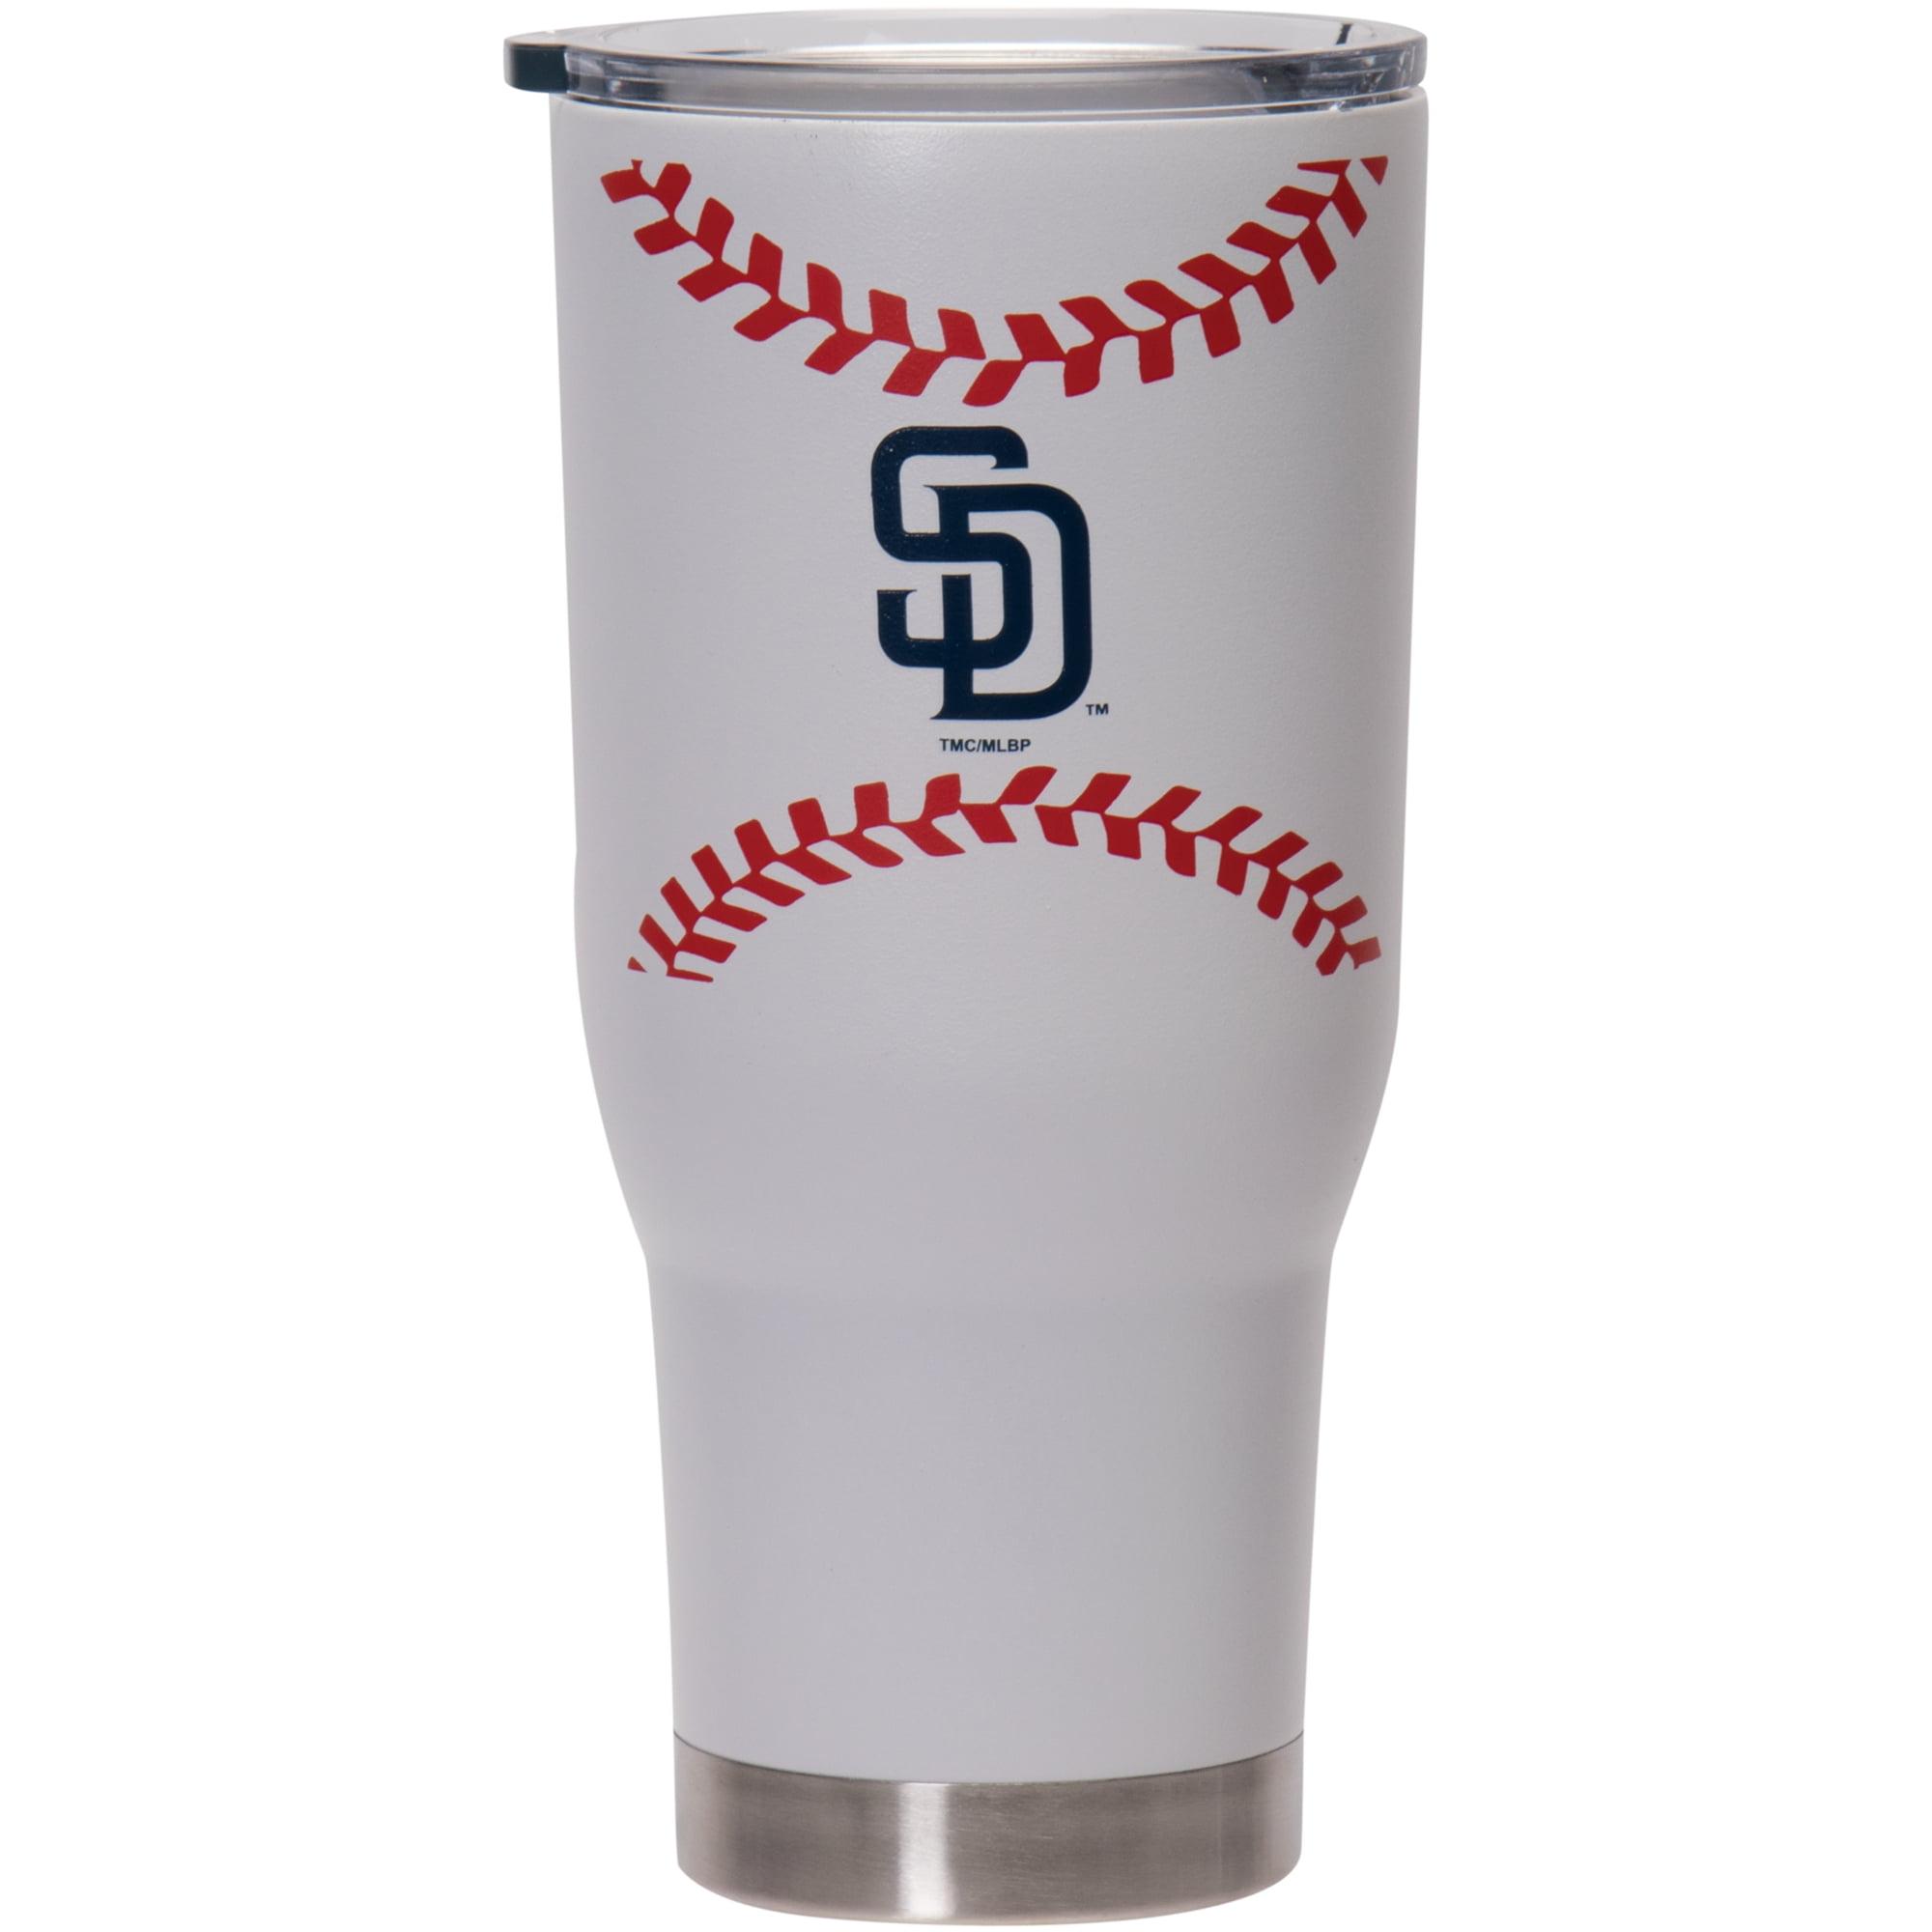 San Diego Padres 32oz. Baseball Tumbler - No Size